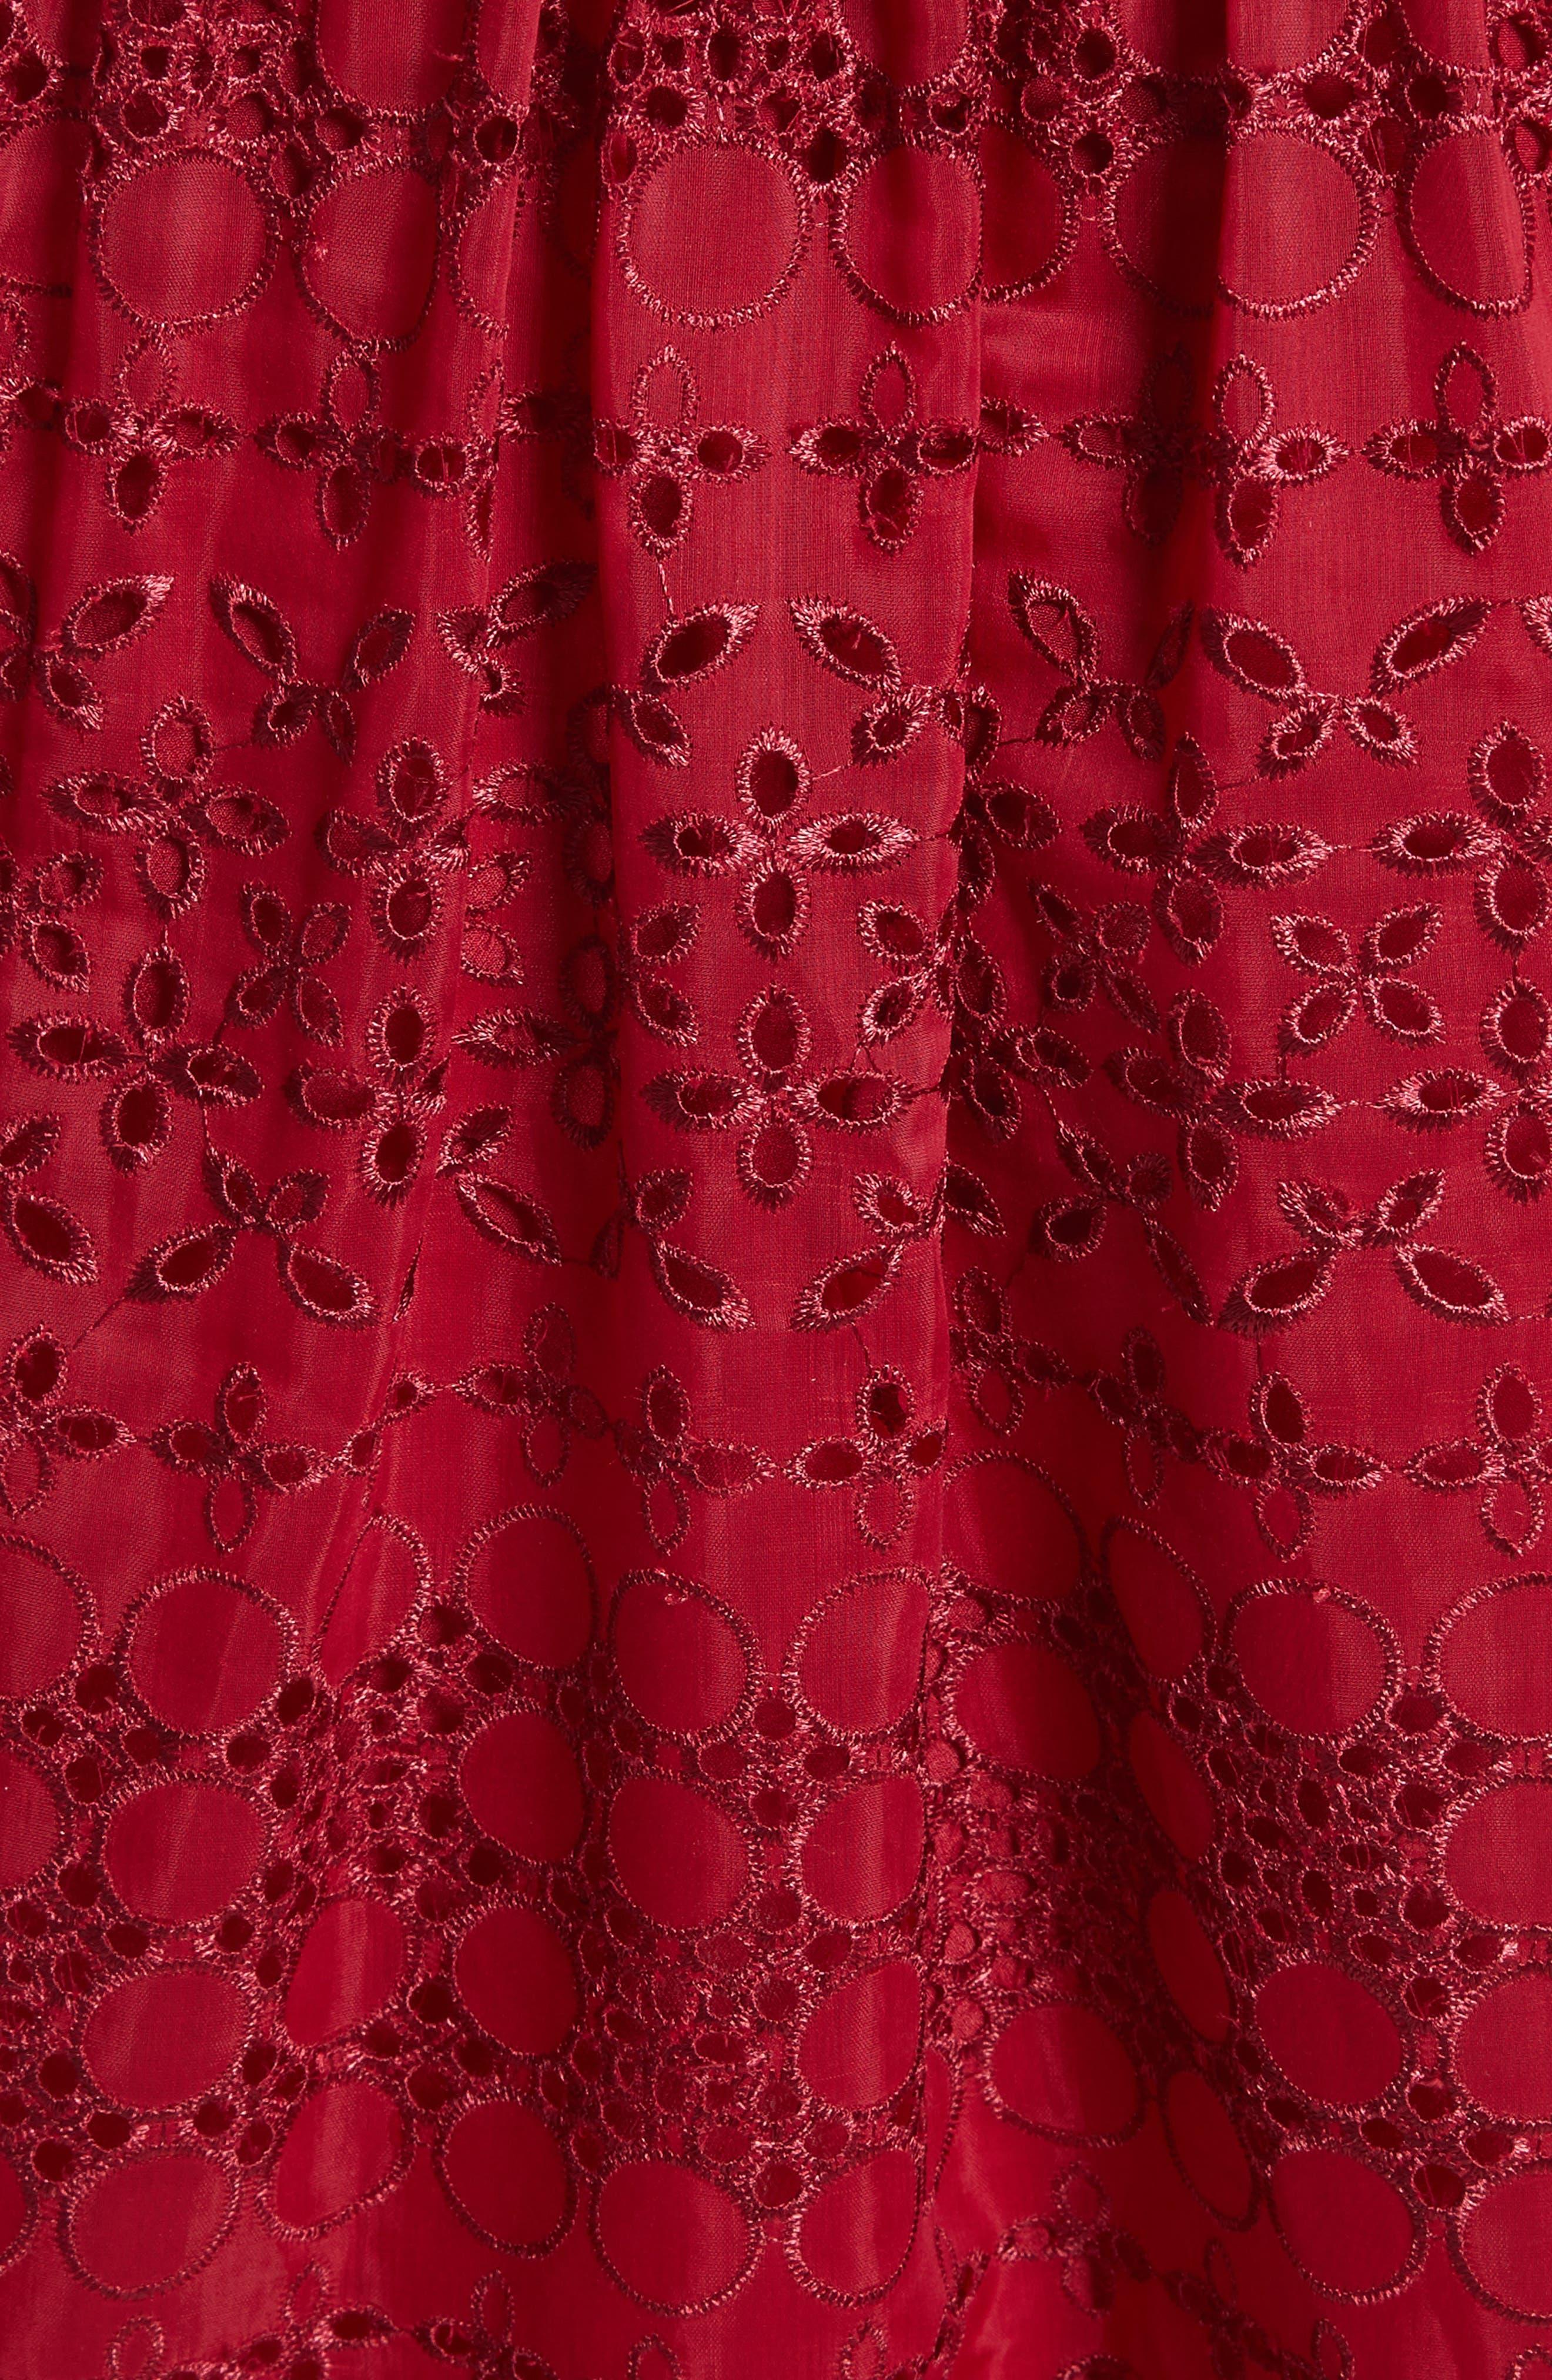 Cutout One-Shoulder Midi Dress,                             Alternate thumbnail 5, color,                             Raspberry Red